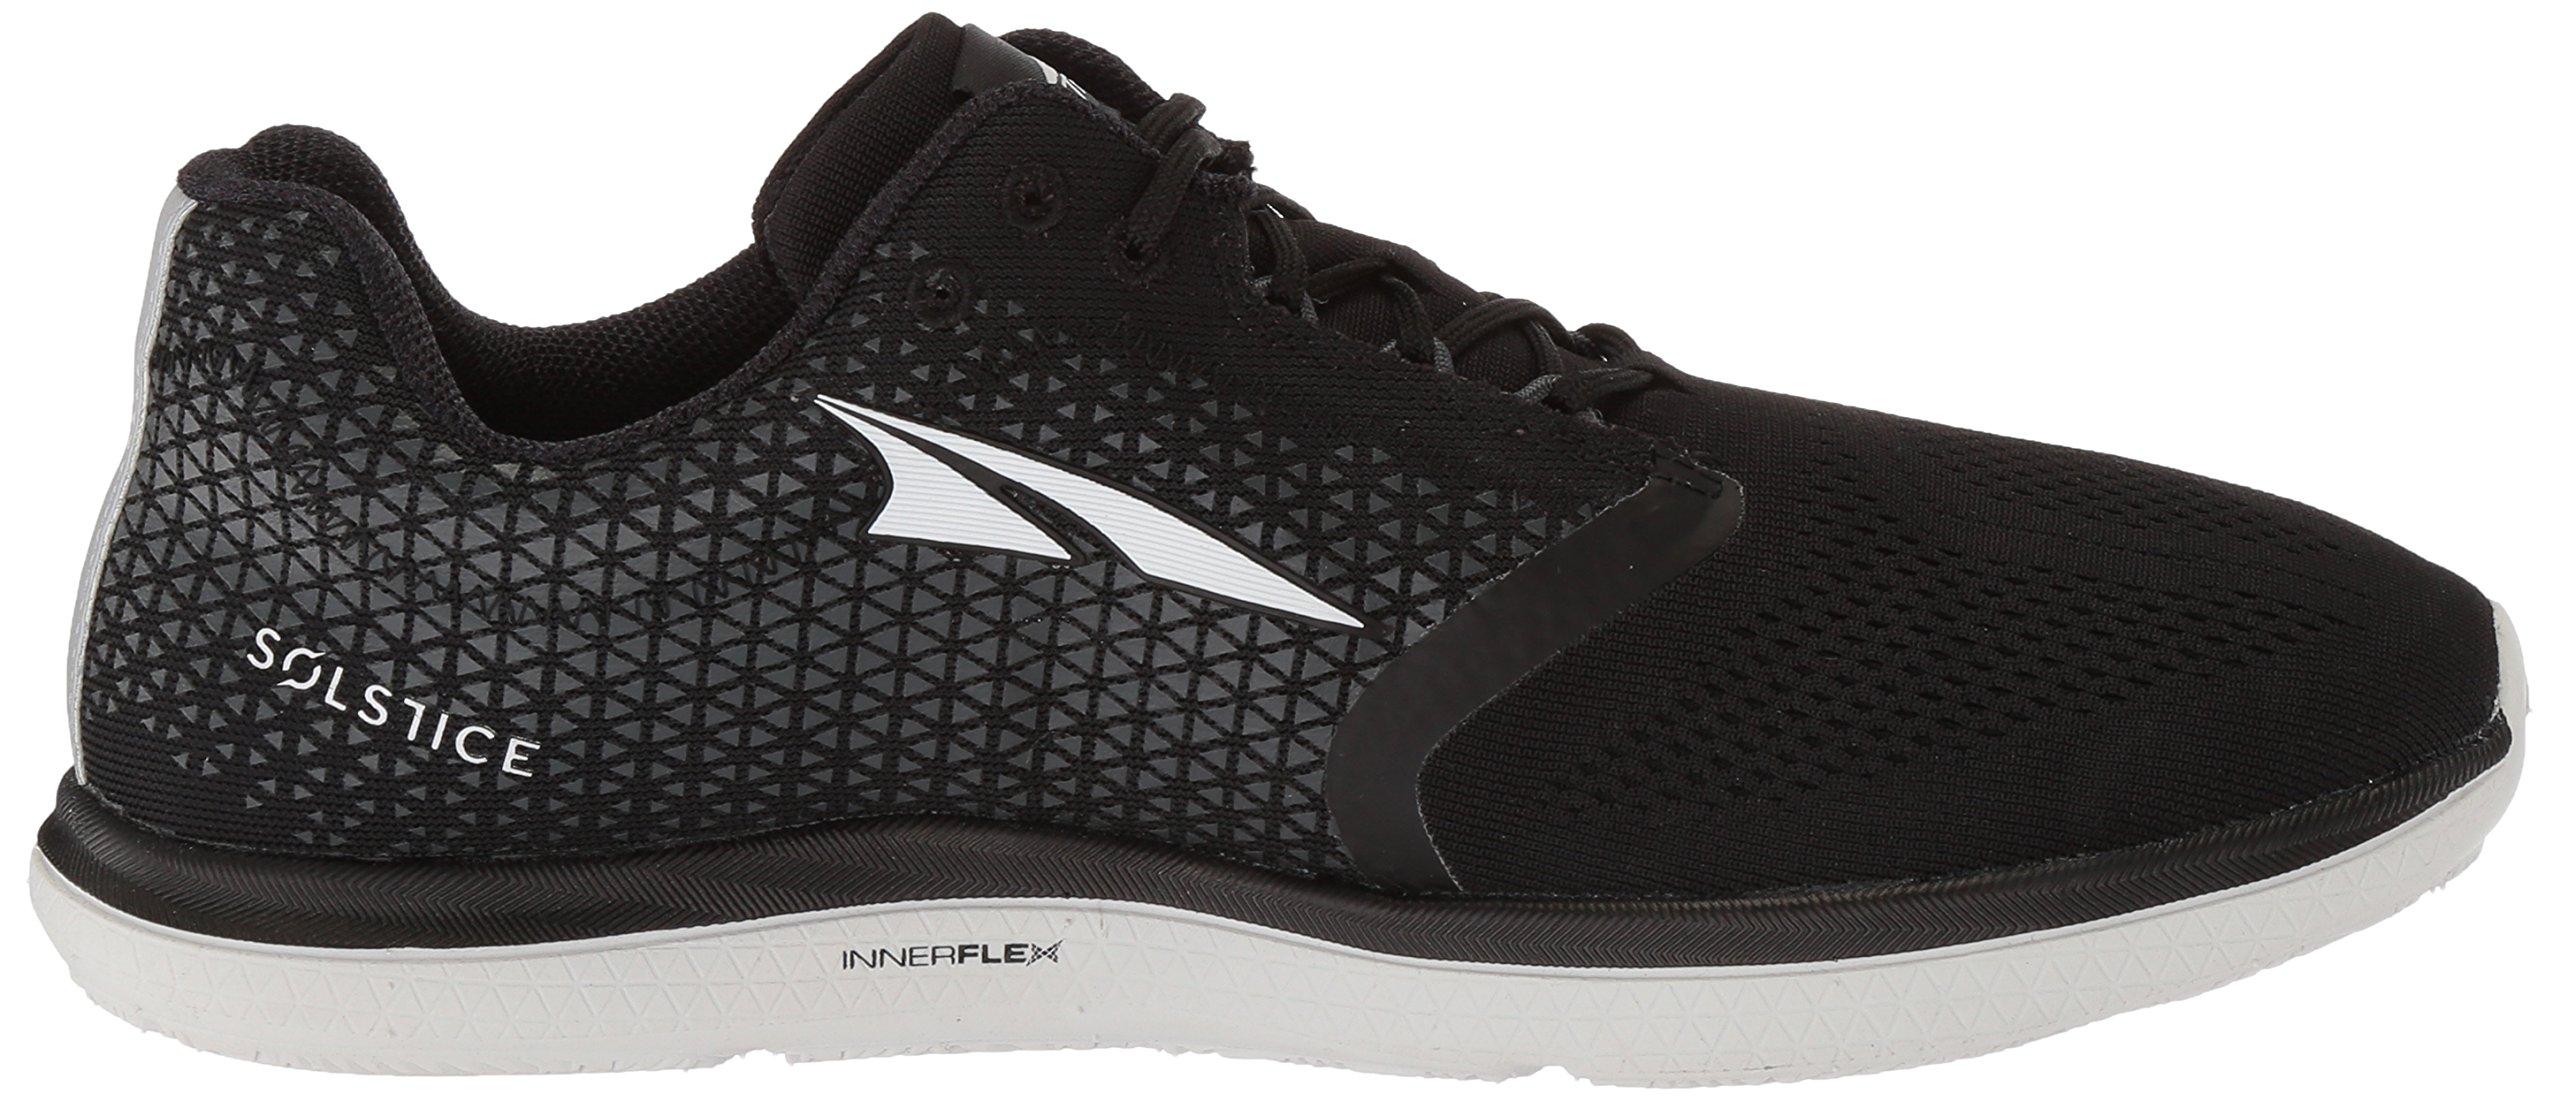 Altra Men's Solstice Sneaker Black 8.5 Regular US by Altra (Image #7)